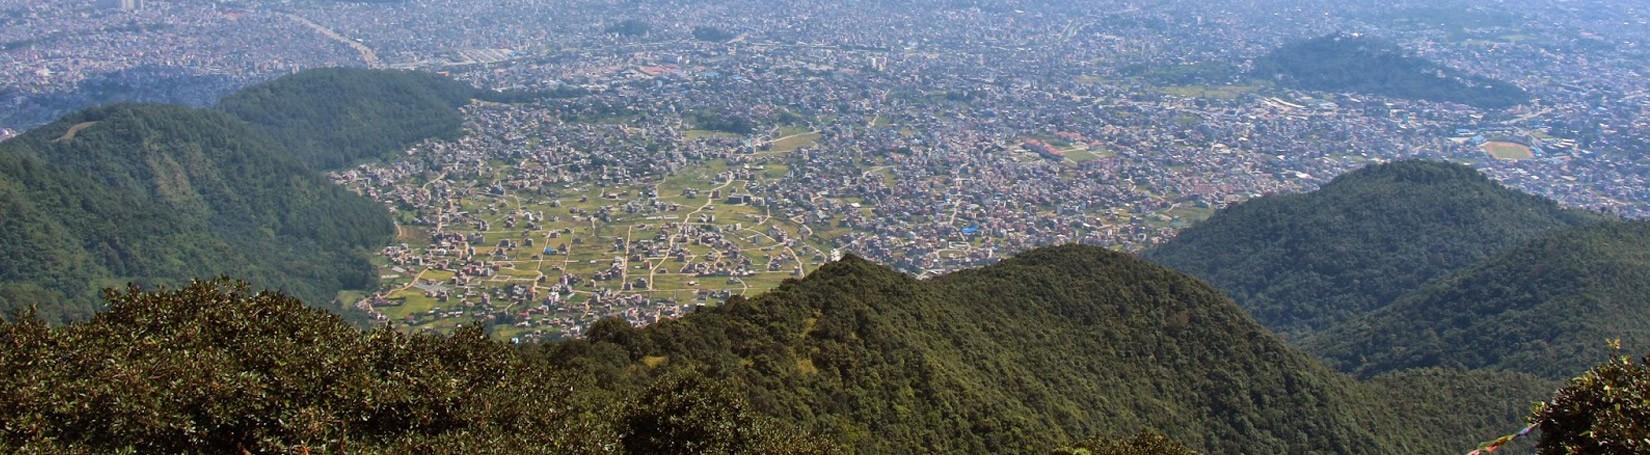 View from Top of Jamacho Shivapuri National Park